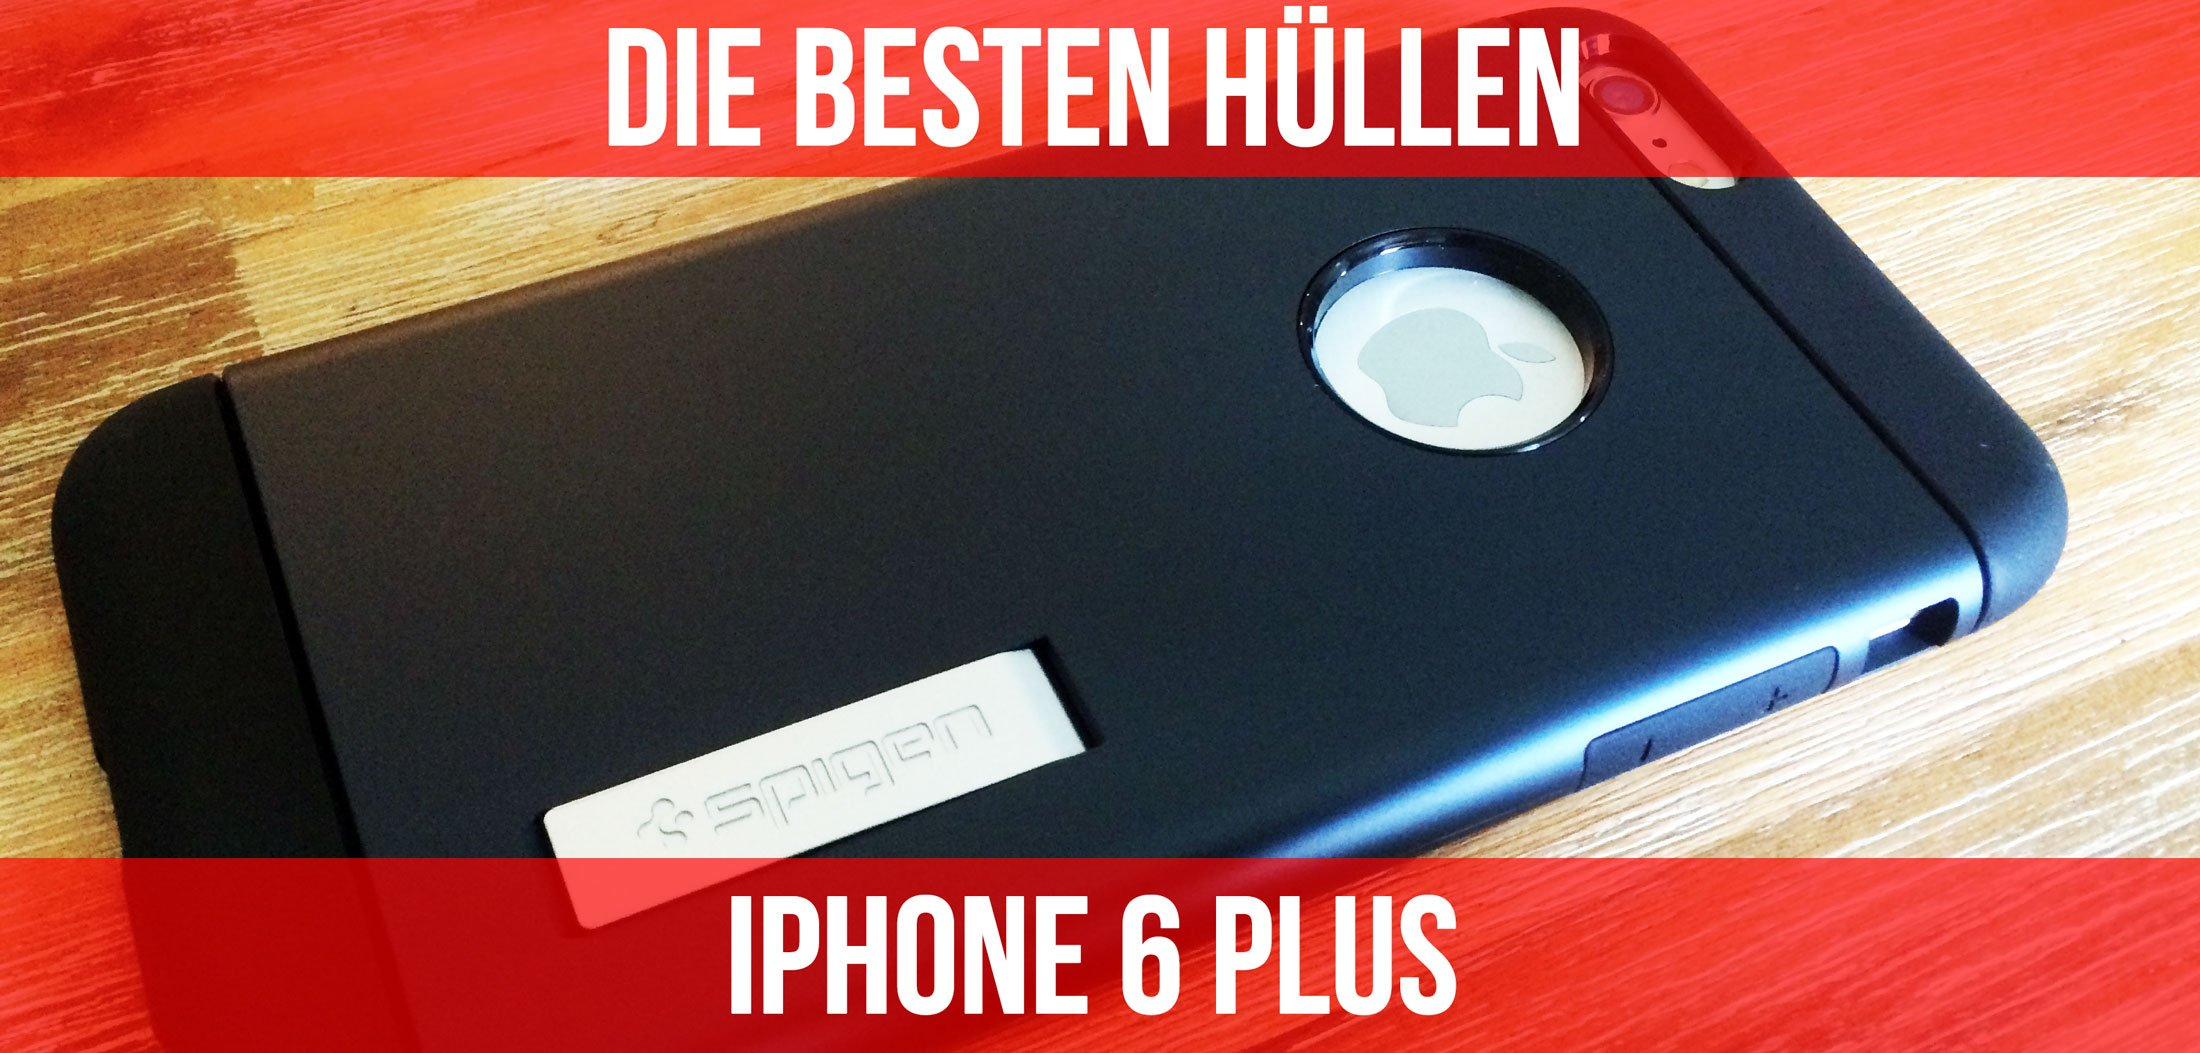 iphone 6 plus h llen test die besten iphone 6 plus cases. Black Bedroom Furniture Sets. Home Design Ideas